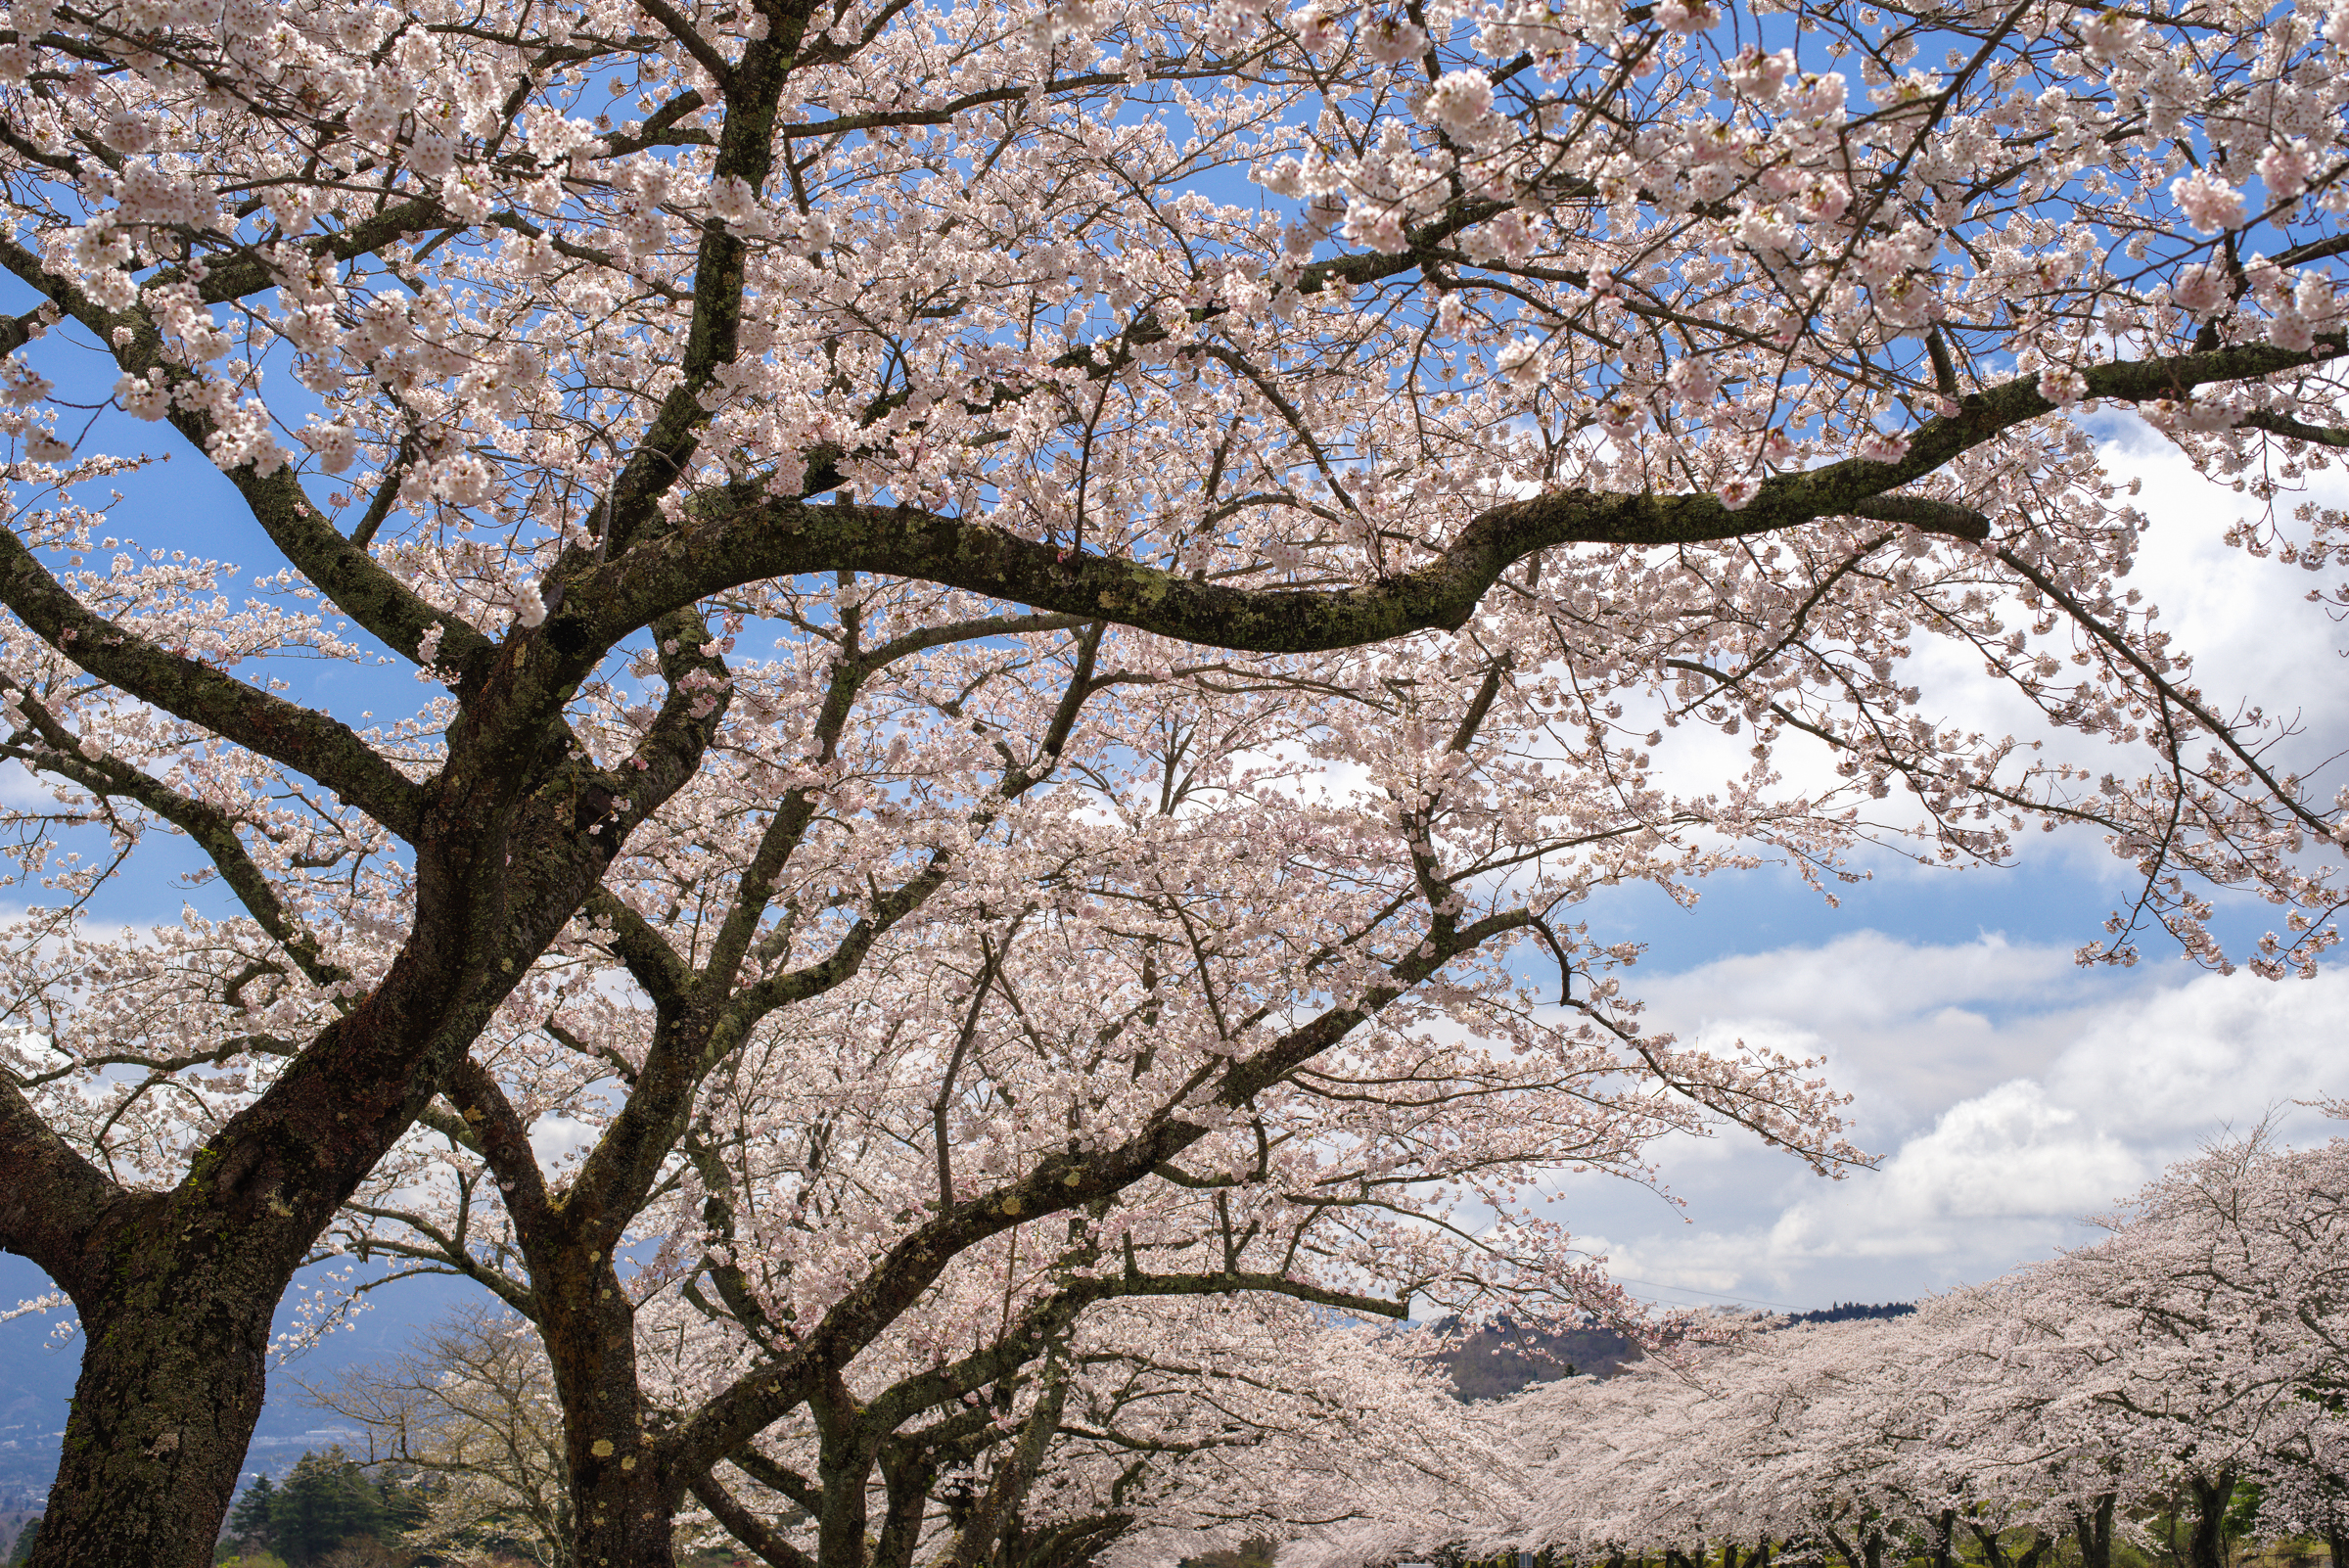 富士霊園の桜 | PENTAX K-1&D FA★50mm